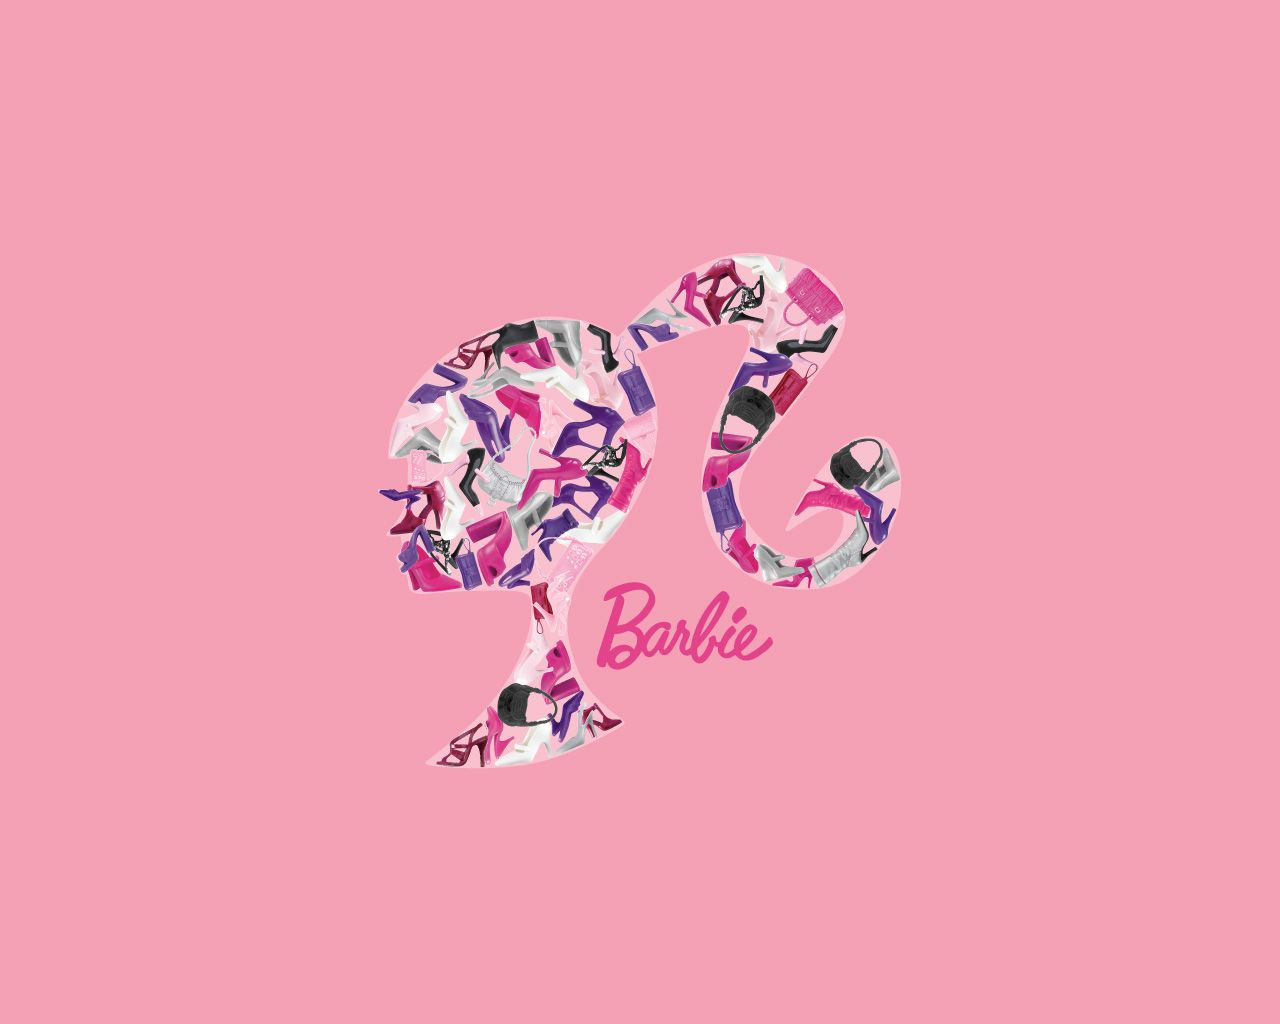 Barbie Doll Wallpapers Wallpaper